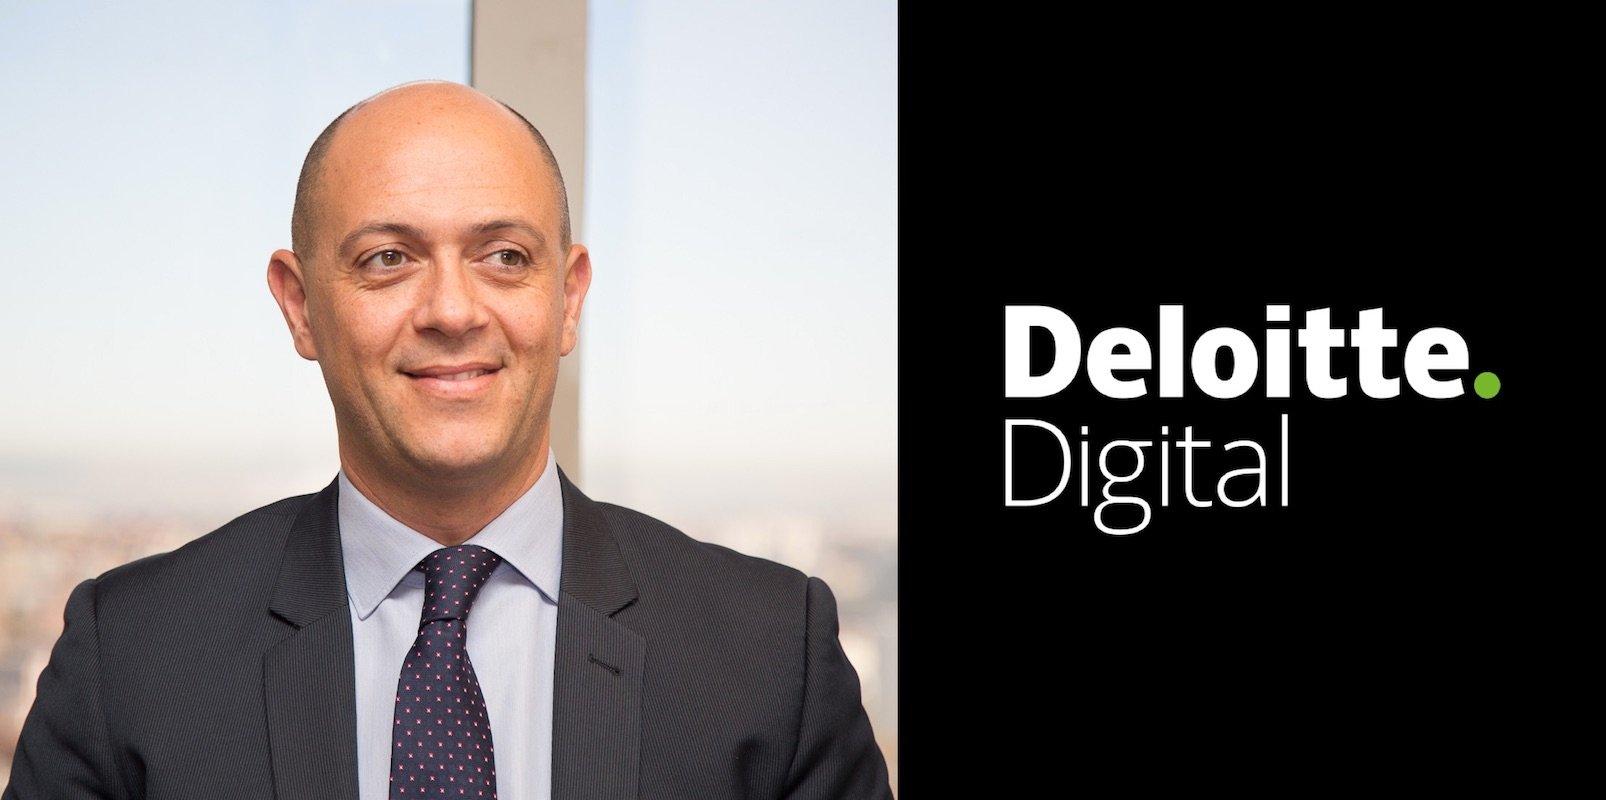 Pablo González Muñoz Deloitte Digital Blockchain